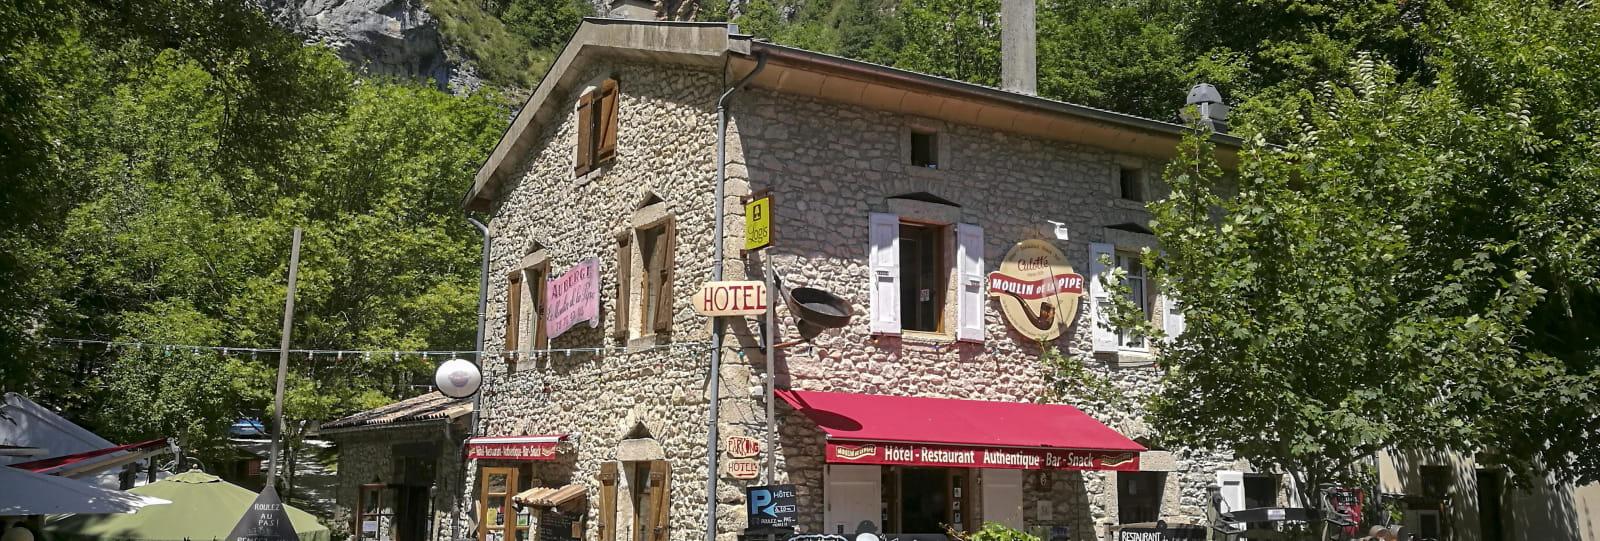 Hôtel-Restaurant-Bar-Snack le Moulin de la Pipe